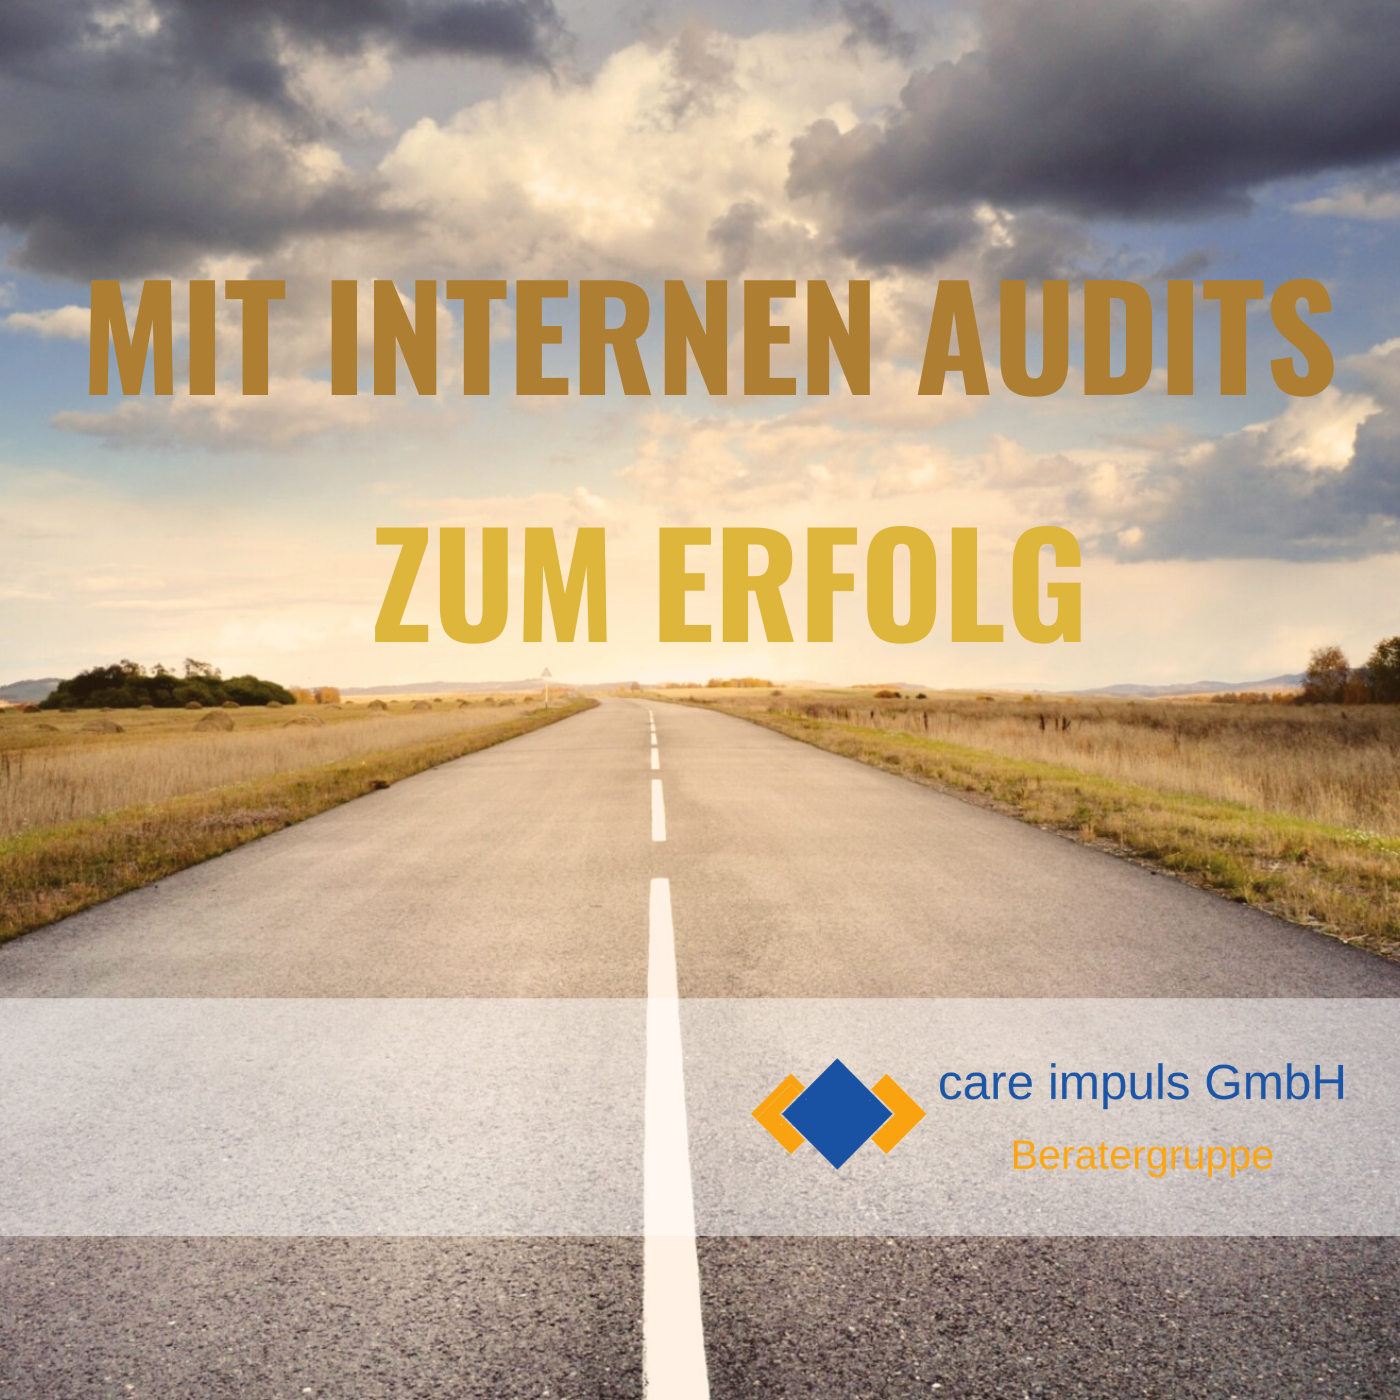 care impuls GmbH Interne Audits